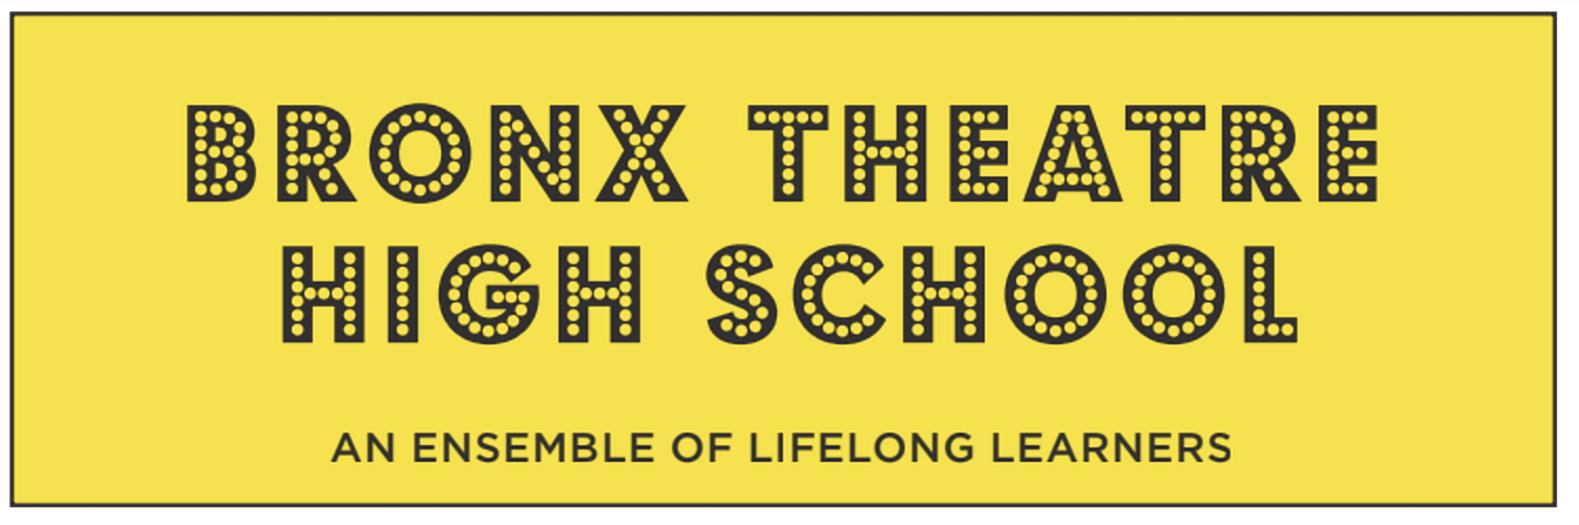 Bronx Theater High School - An Ensemble of Lifelong Learners